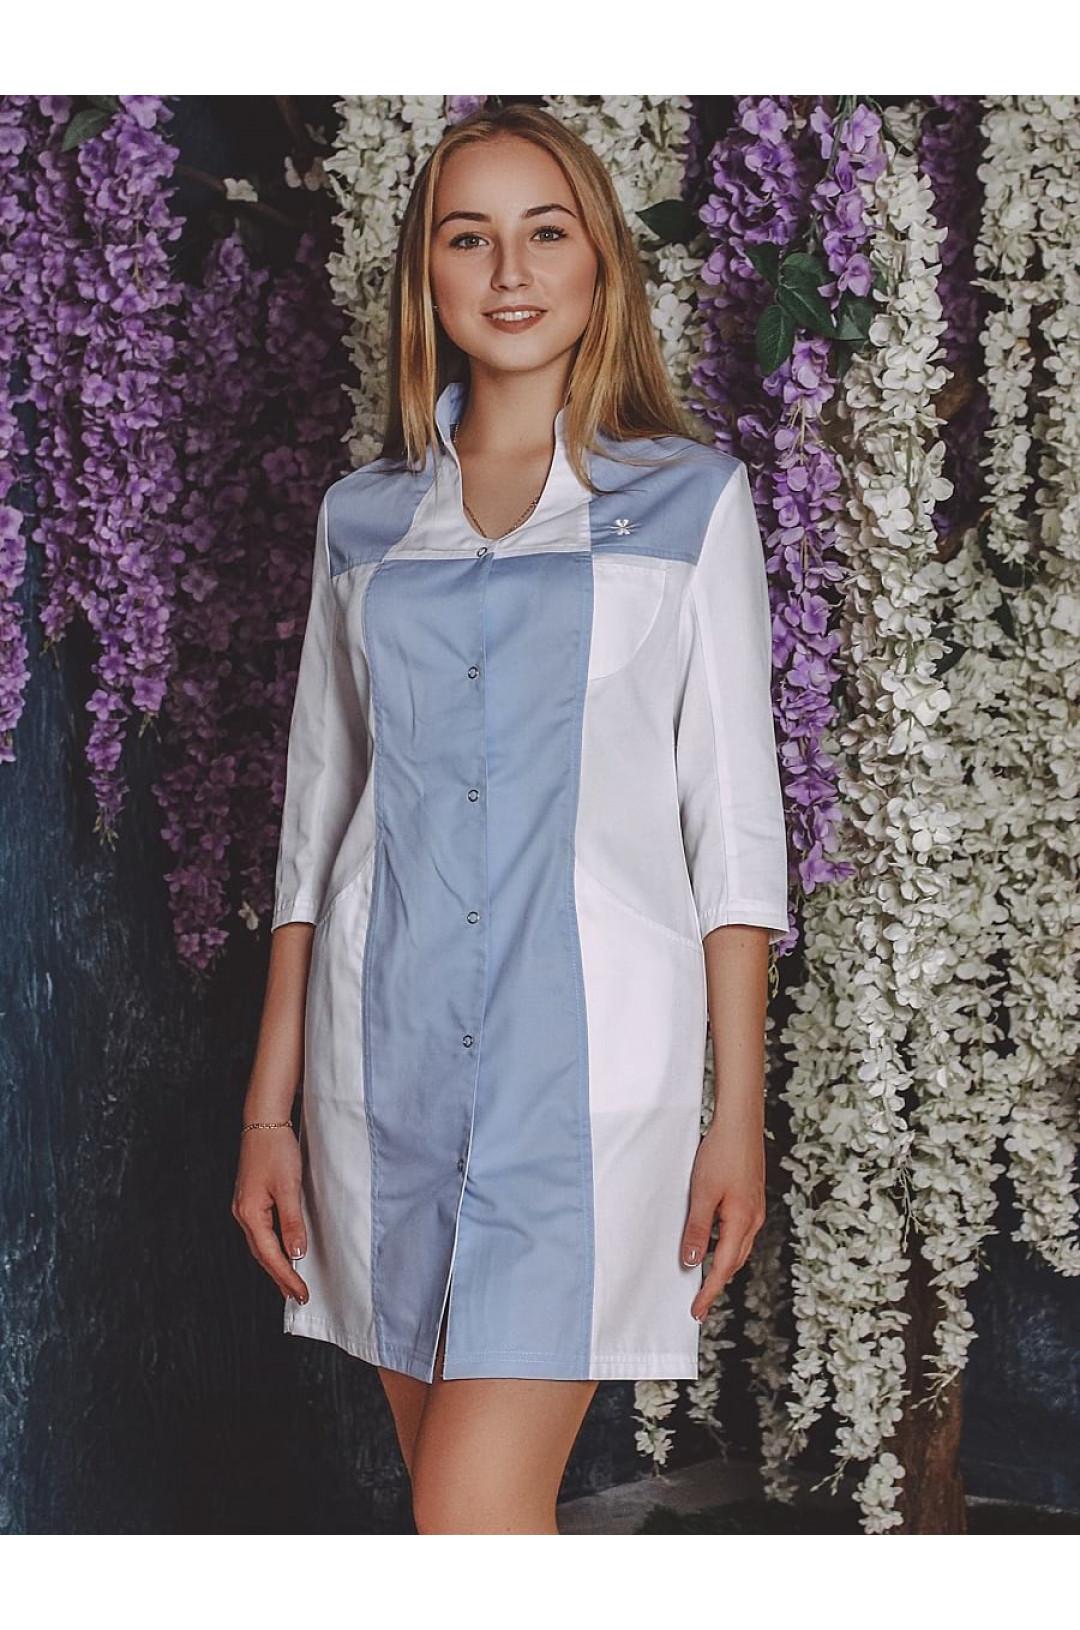 Халат медицинский женский LL 1102 (белый/голубой, тередо)